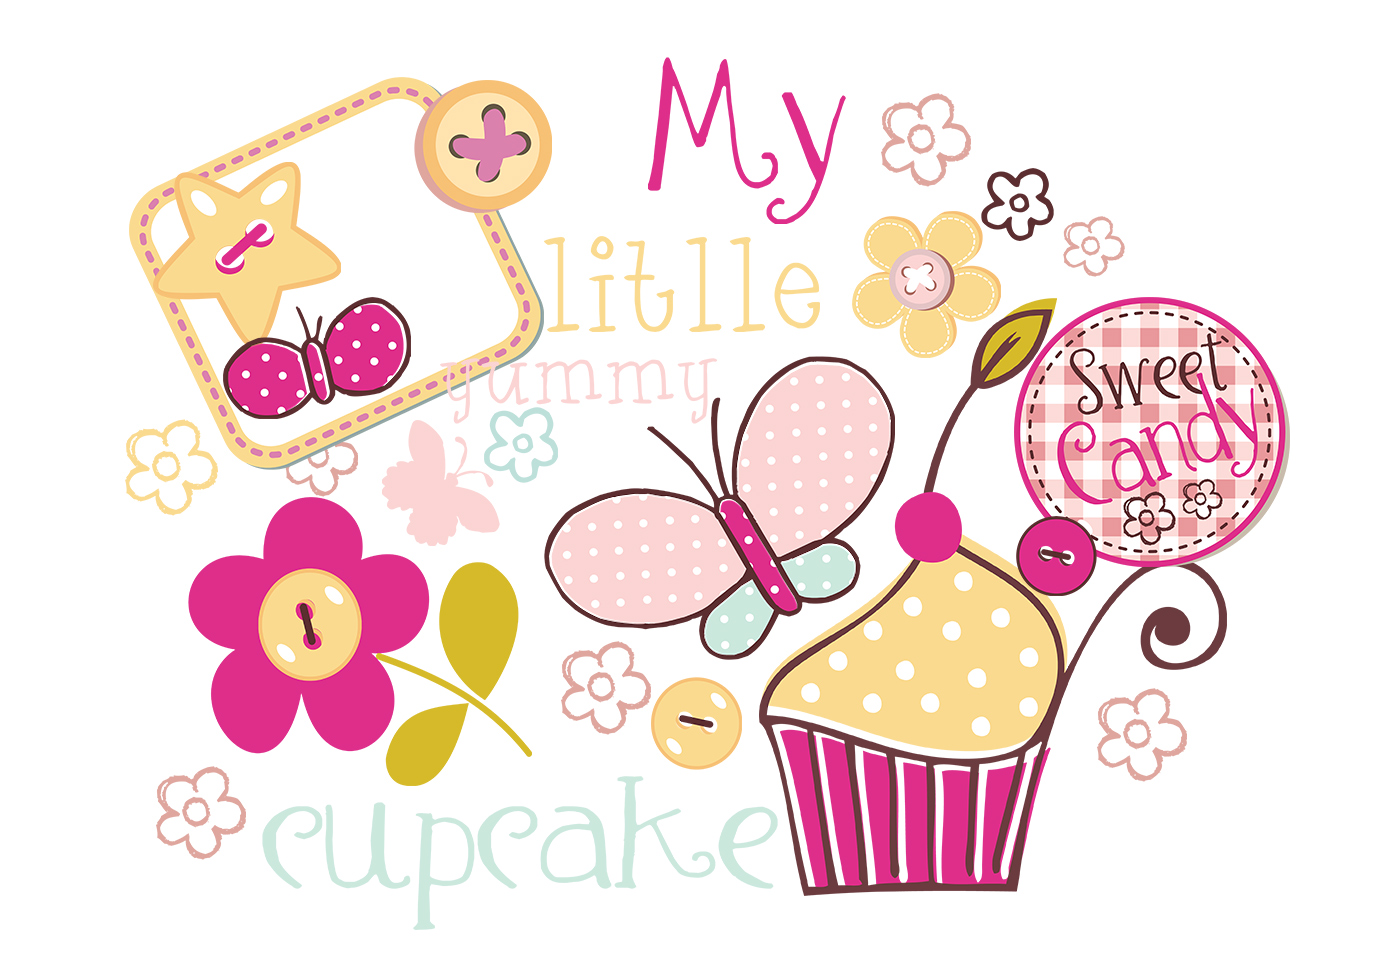 My-yummy-cupcake-vector-pack